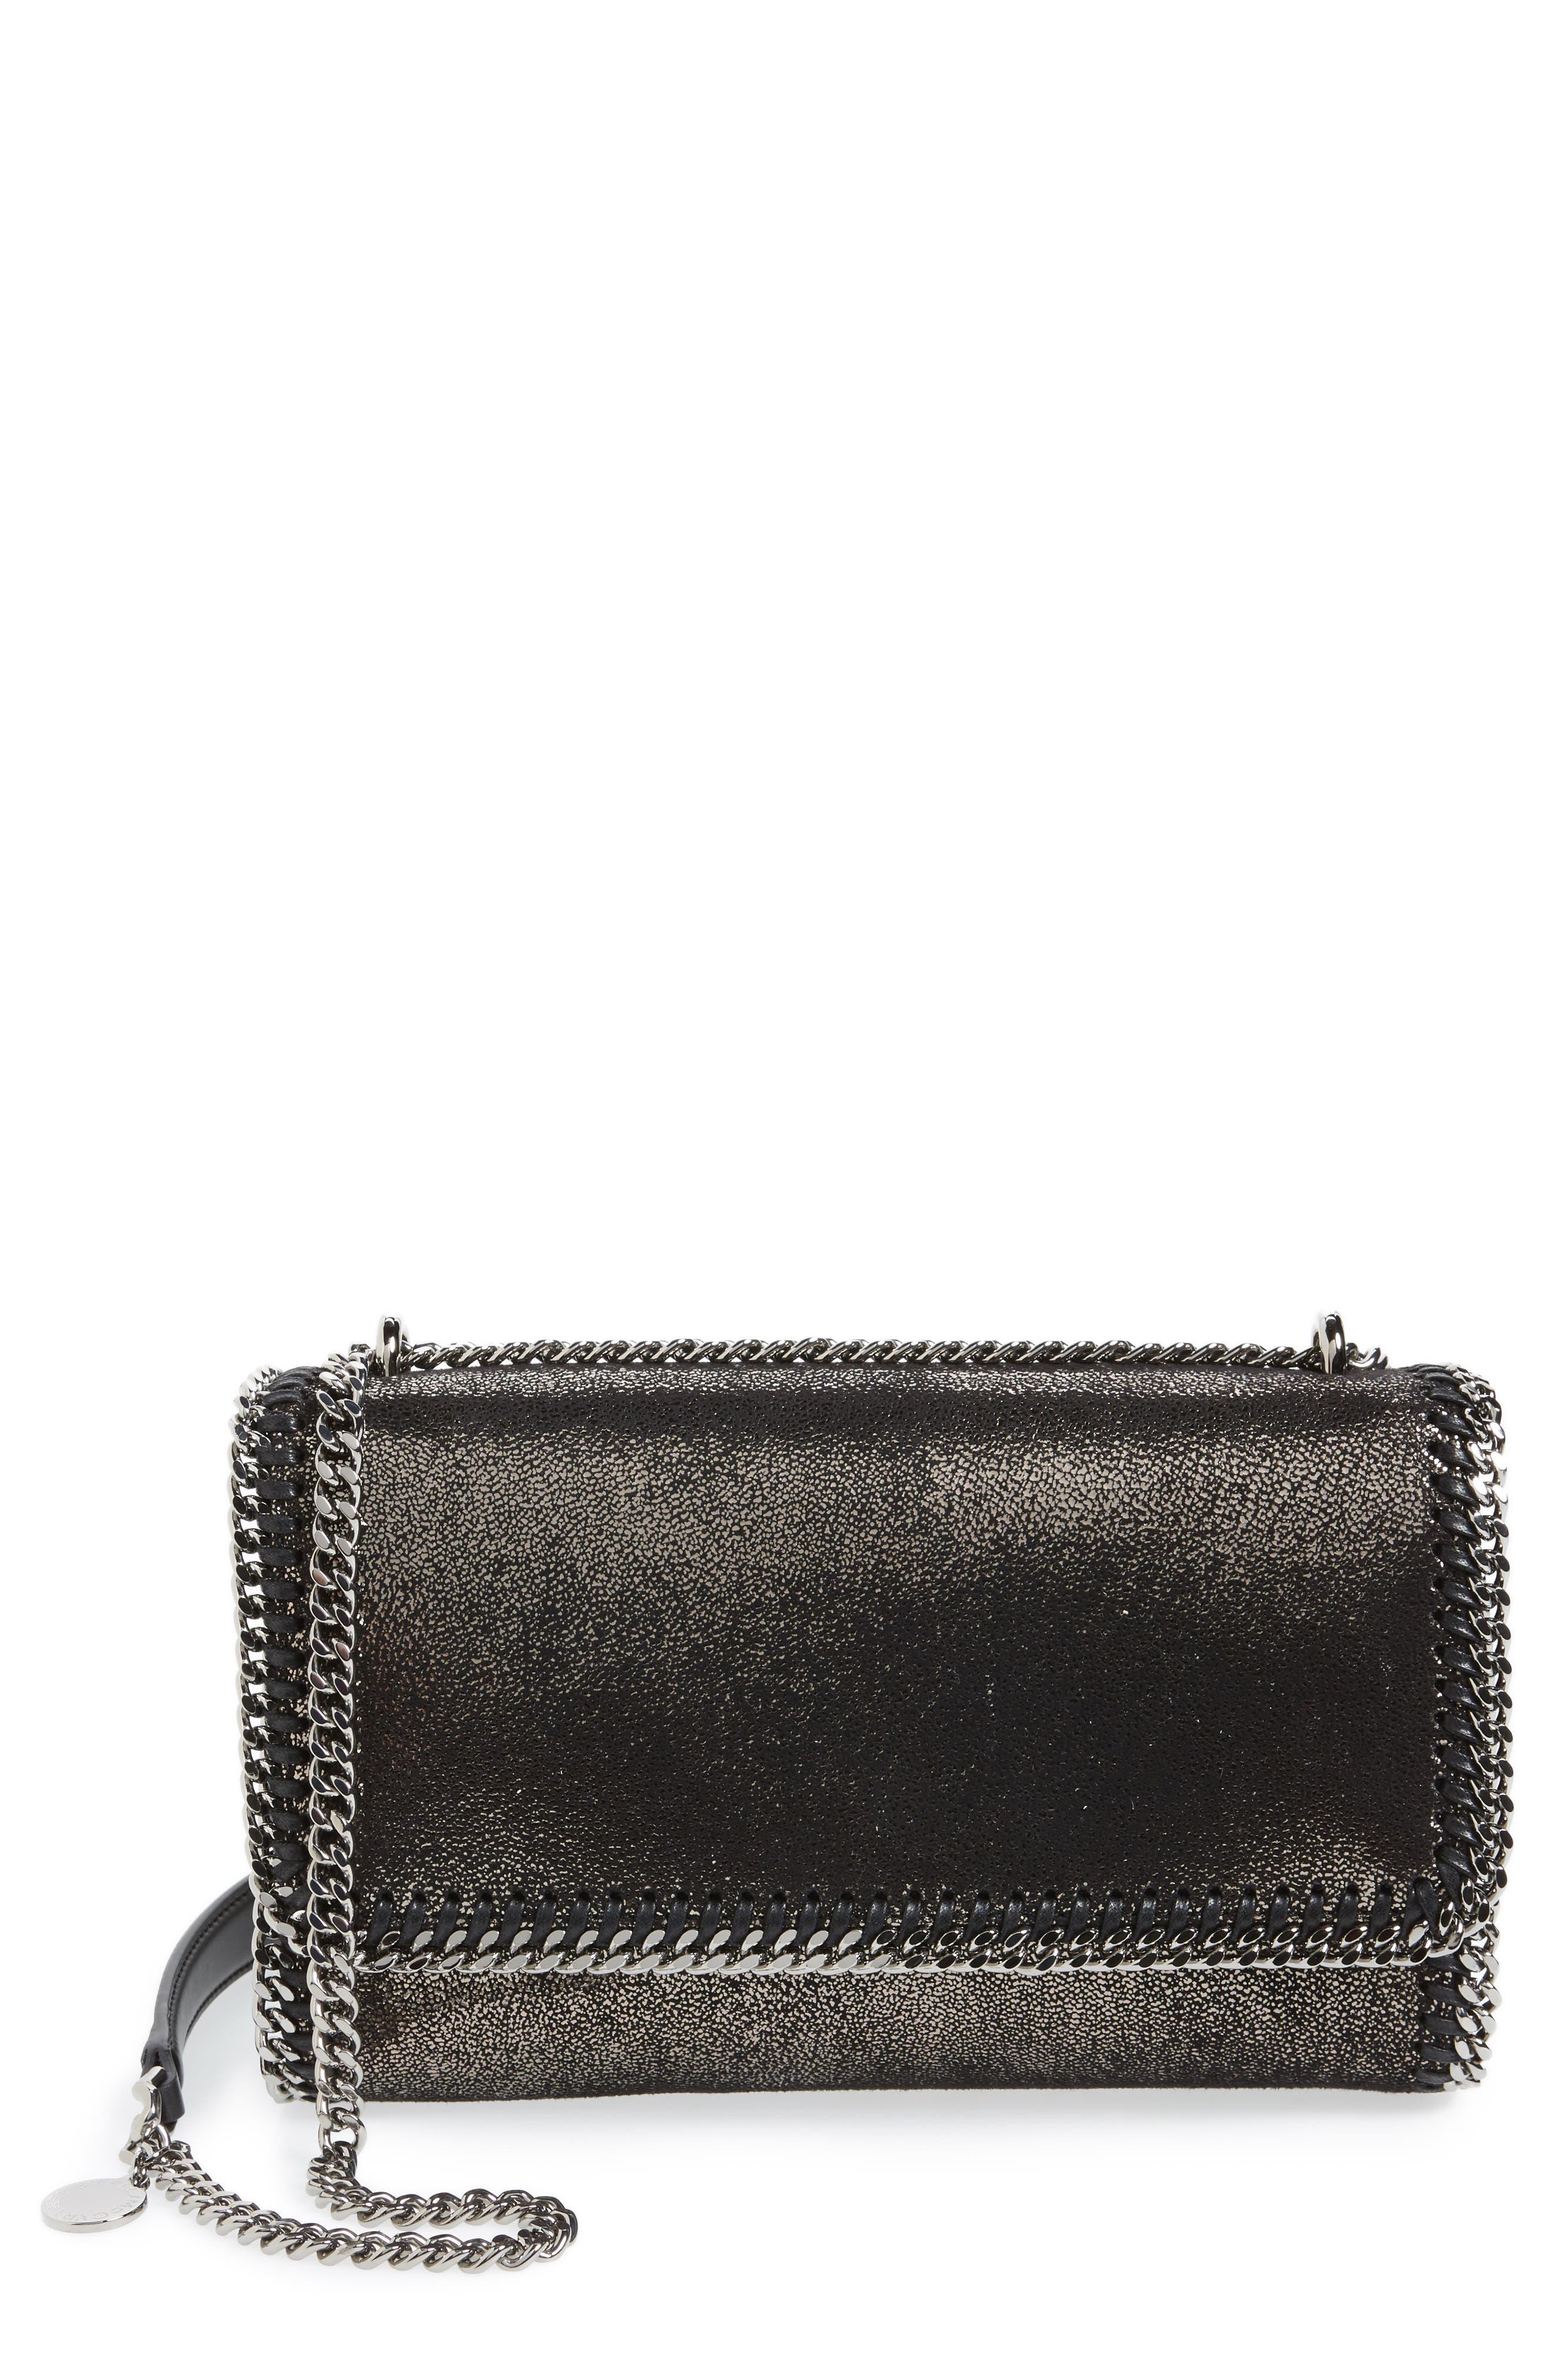 Stella McCartney Faux Leather Flap Shoulder Bag